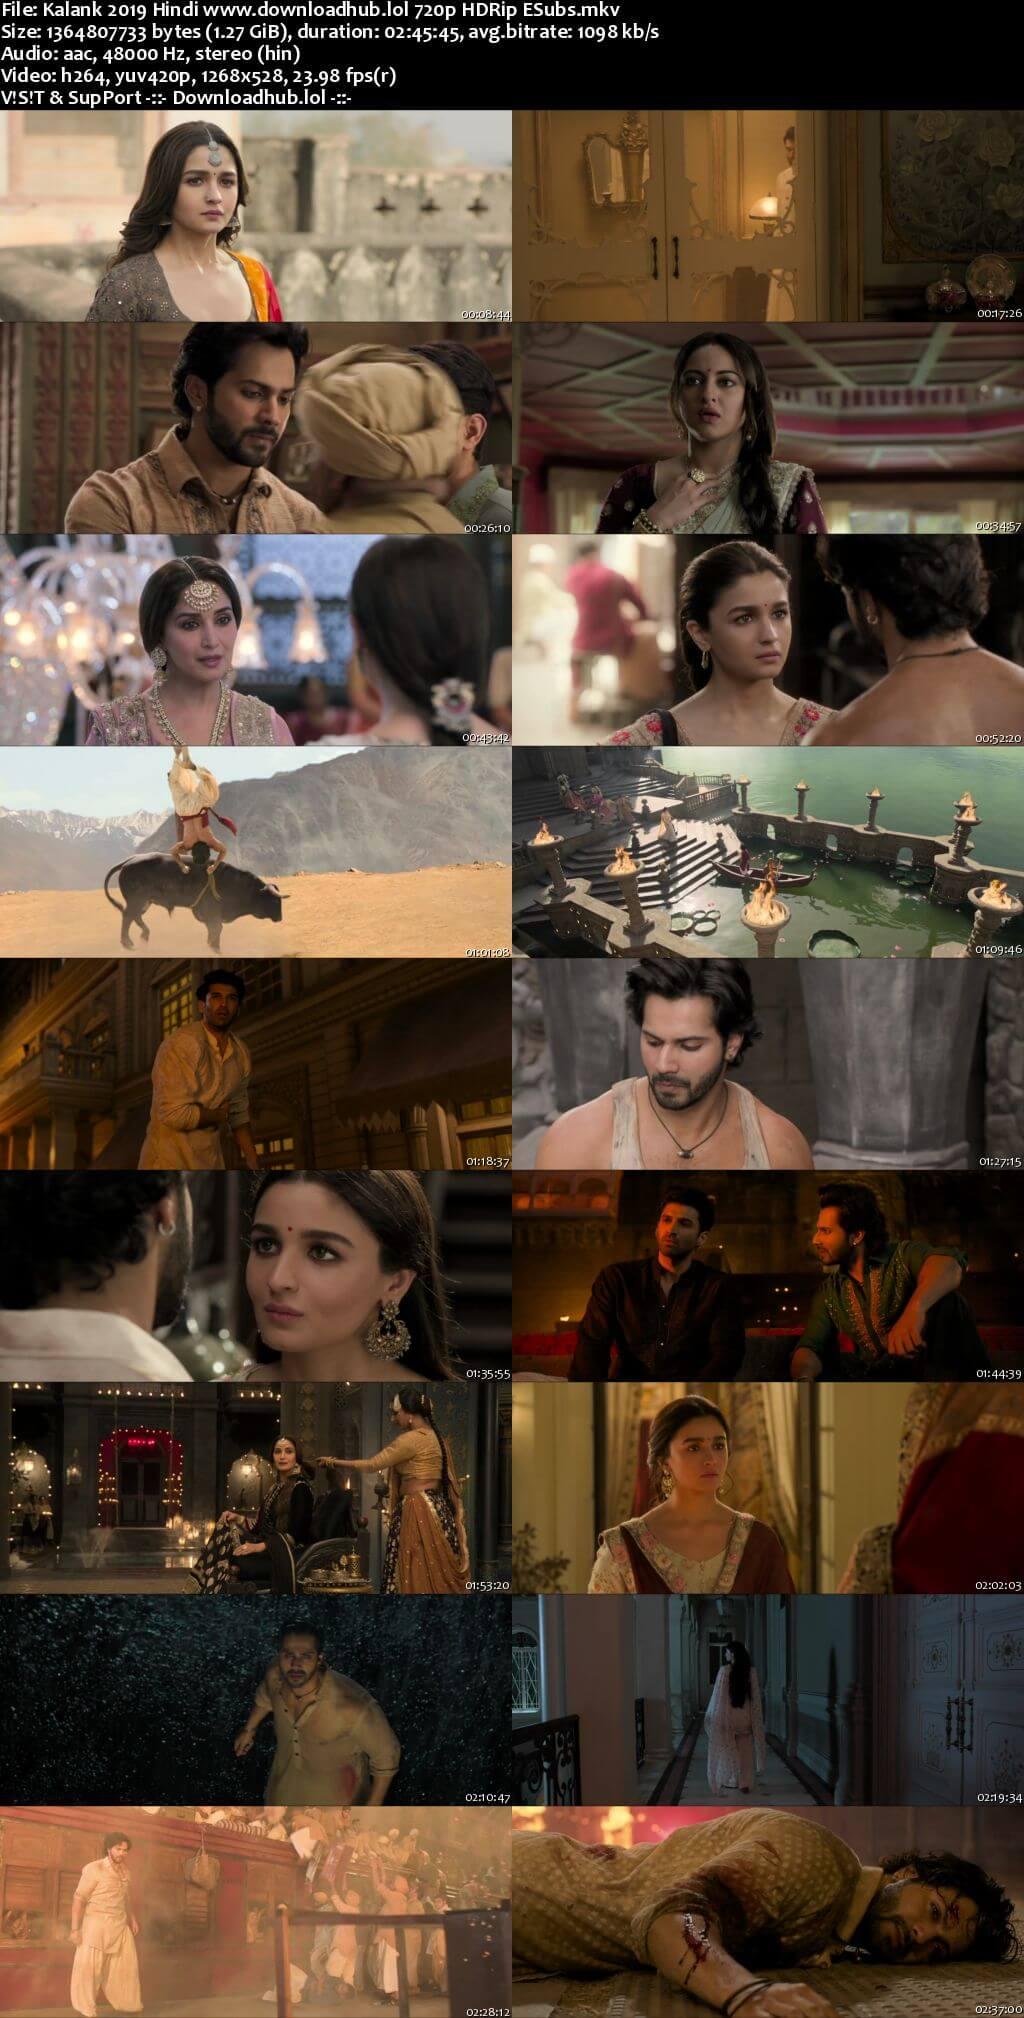 Download Kalank 2019 Hindi Movie 720p HDRip ESubs HEVC